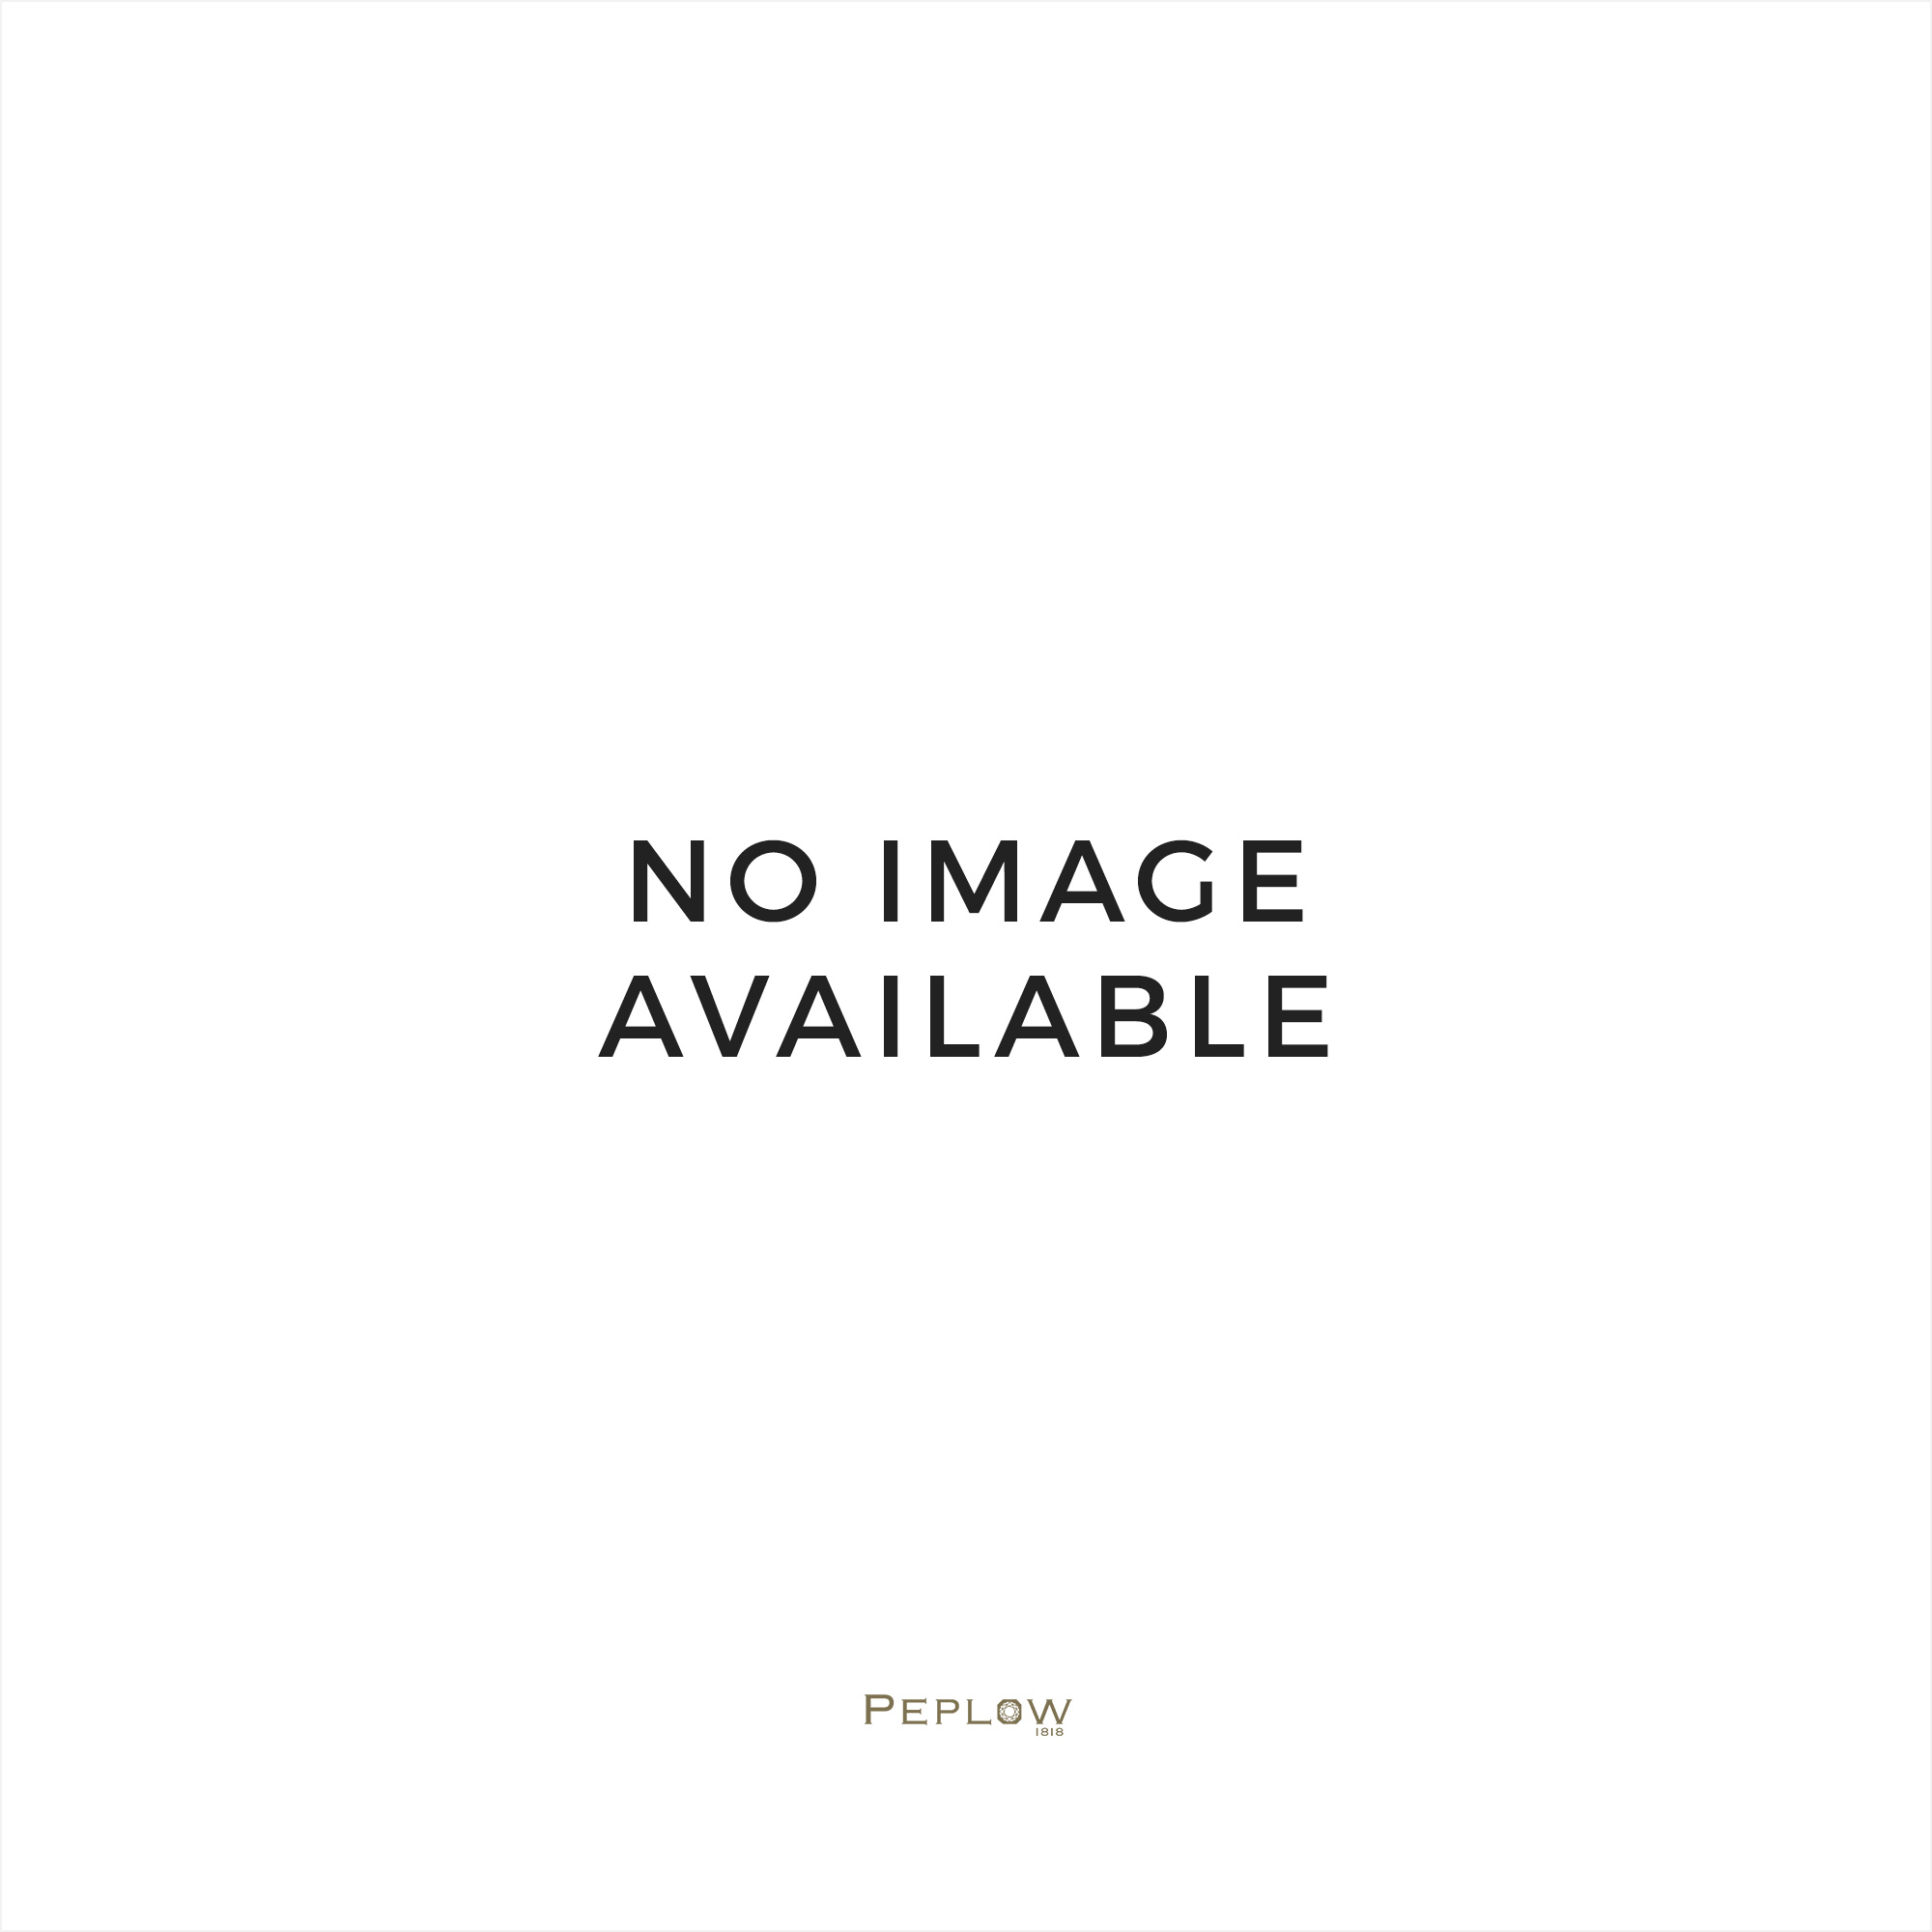 Seiko Watches Seiko Gents Solar watch on Stainless Steel Bracelet